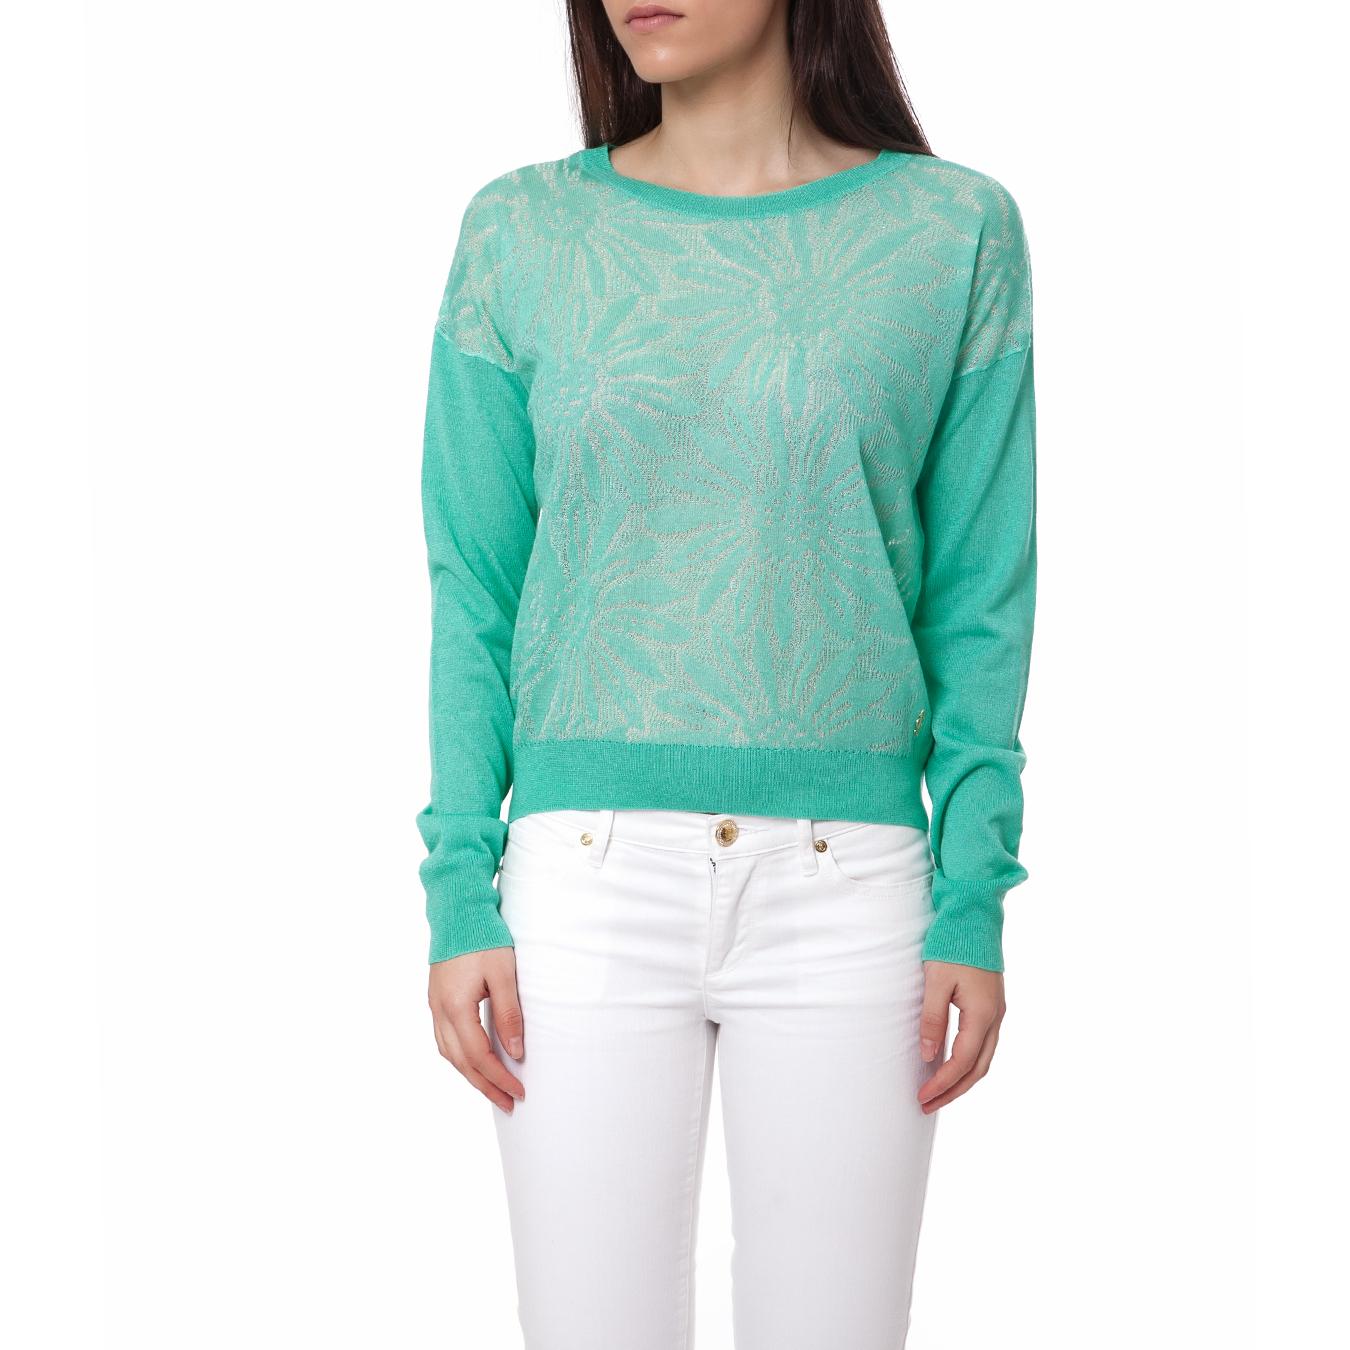 JUICY COUTURE - Γυναικείο πουλόβερ Juicy Couture πράσινο γυναικεία ρούχα πλεκτά ζακέτες πουλόβερ